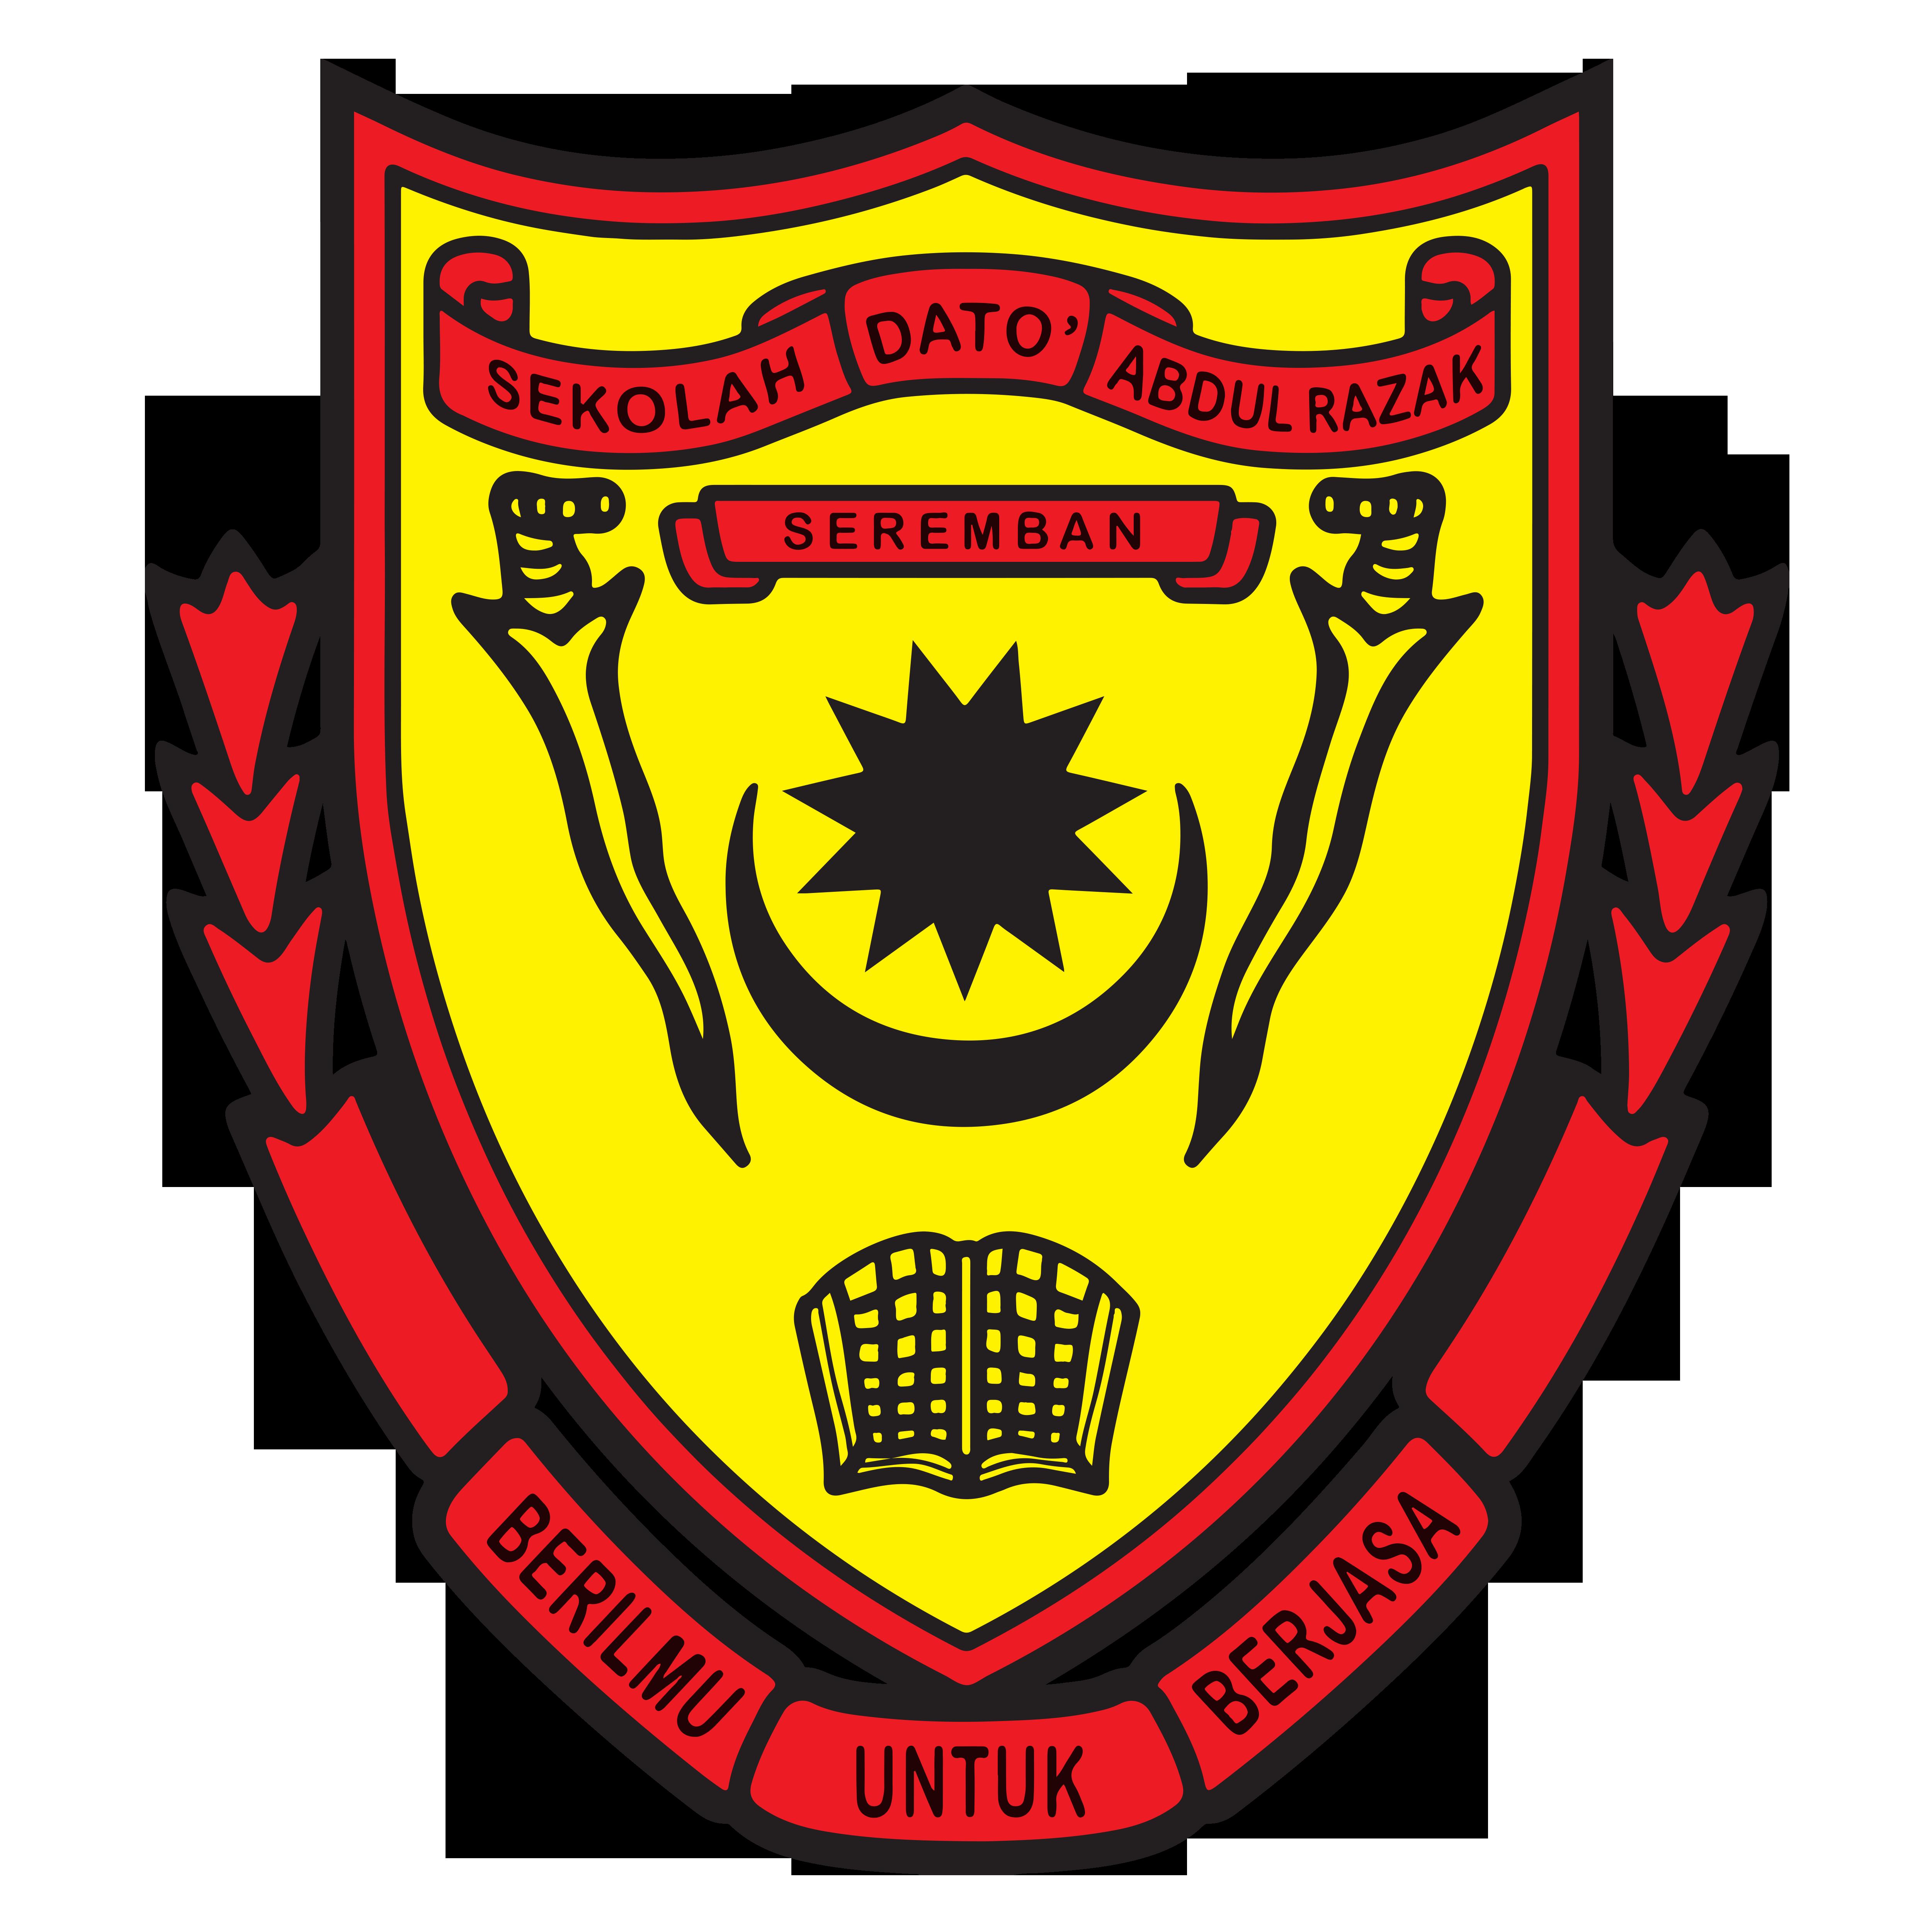 Sekolah Dato Abdul Razak Wikipedia